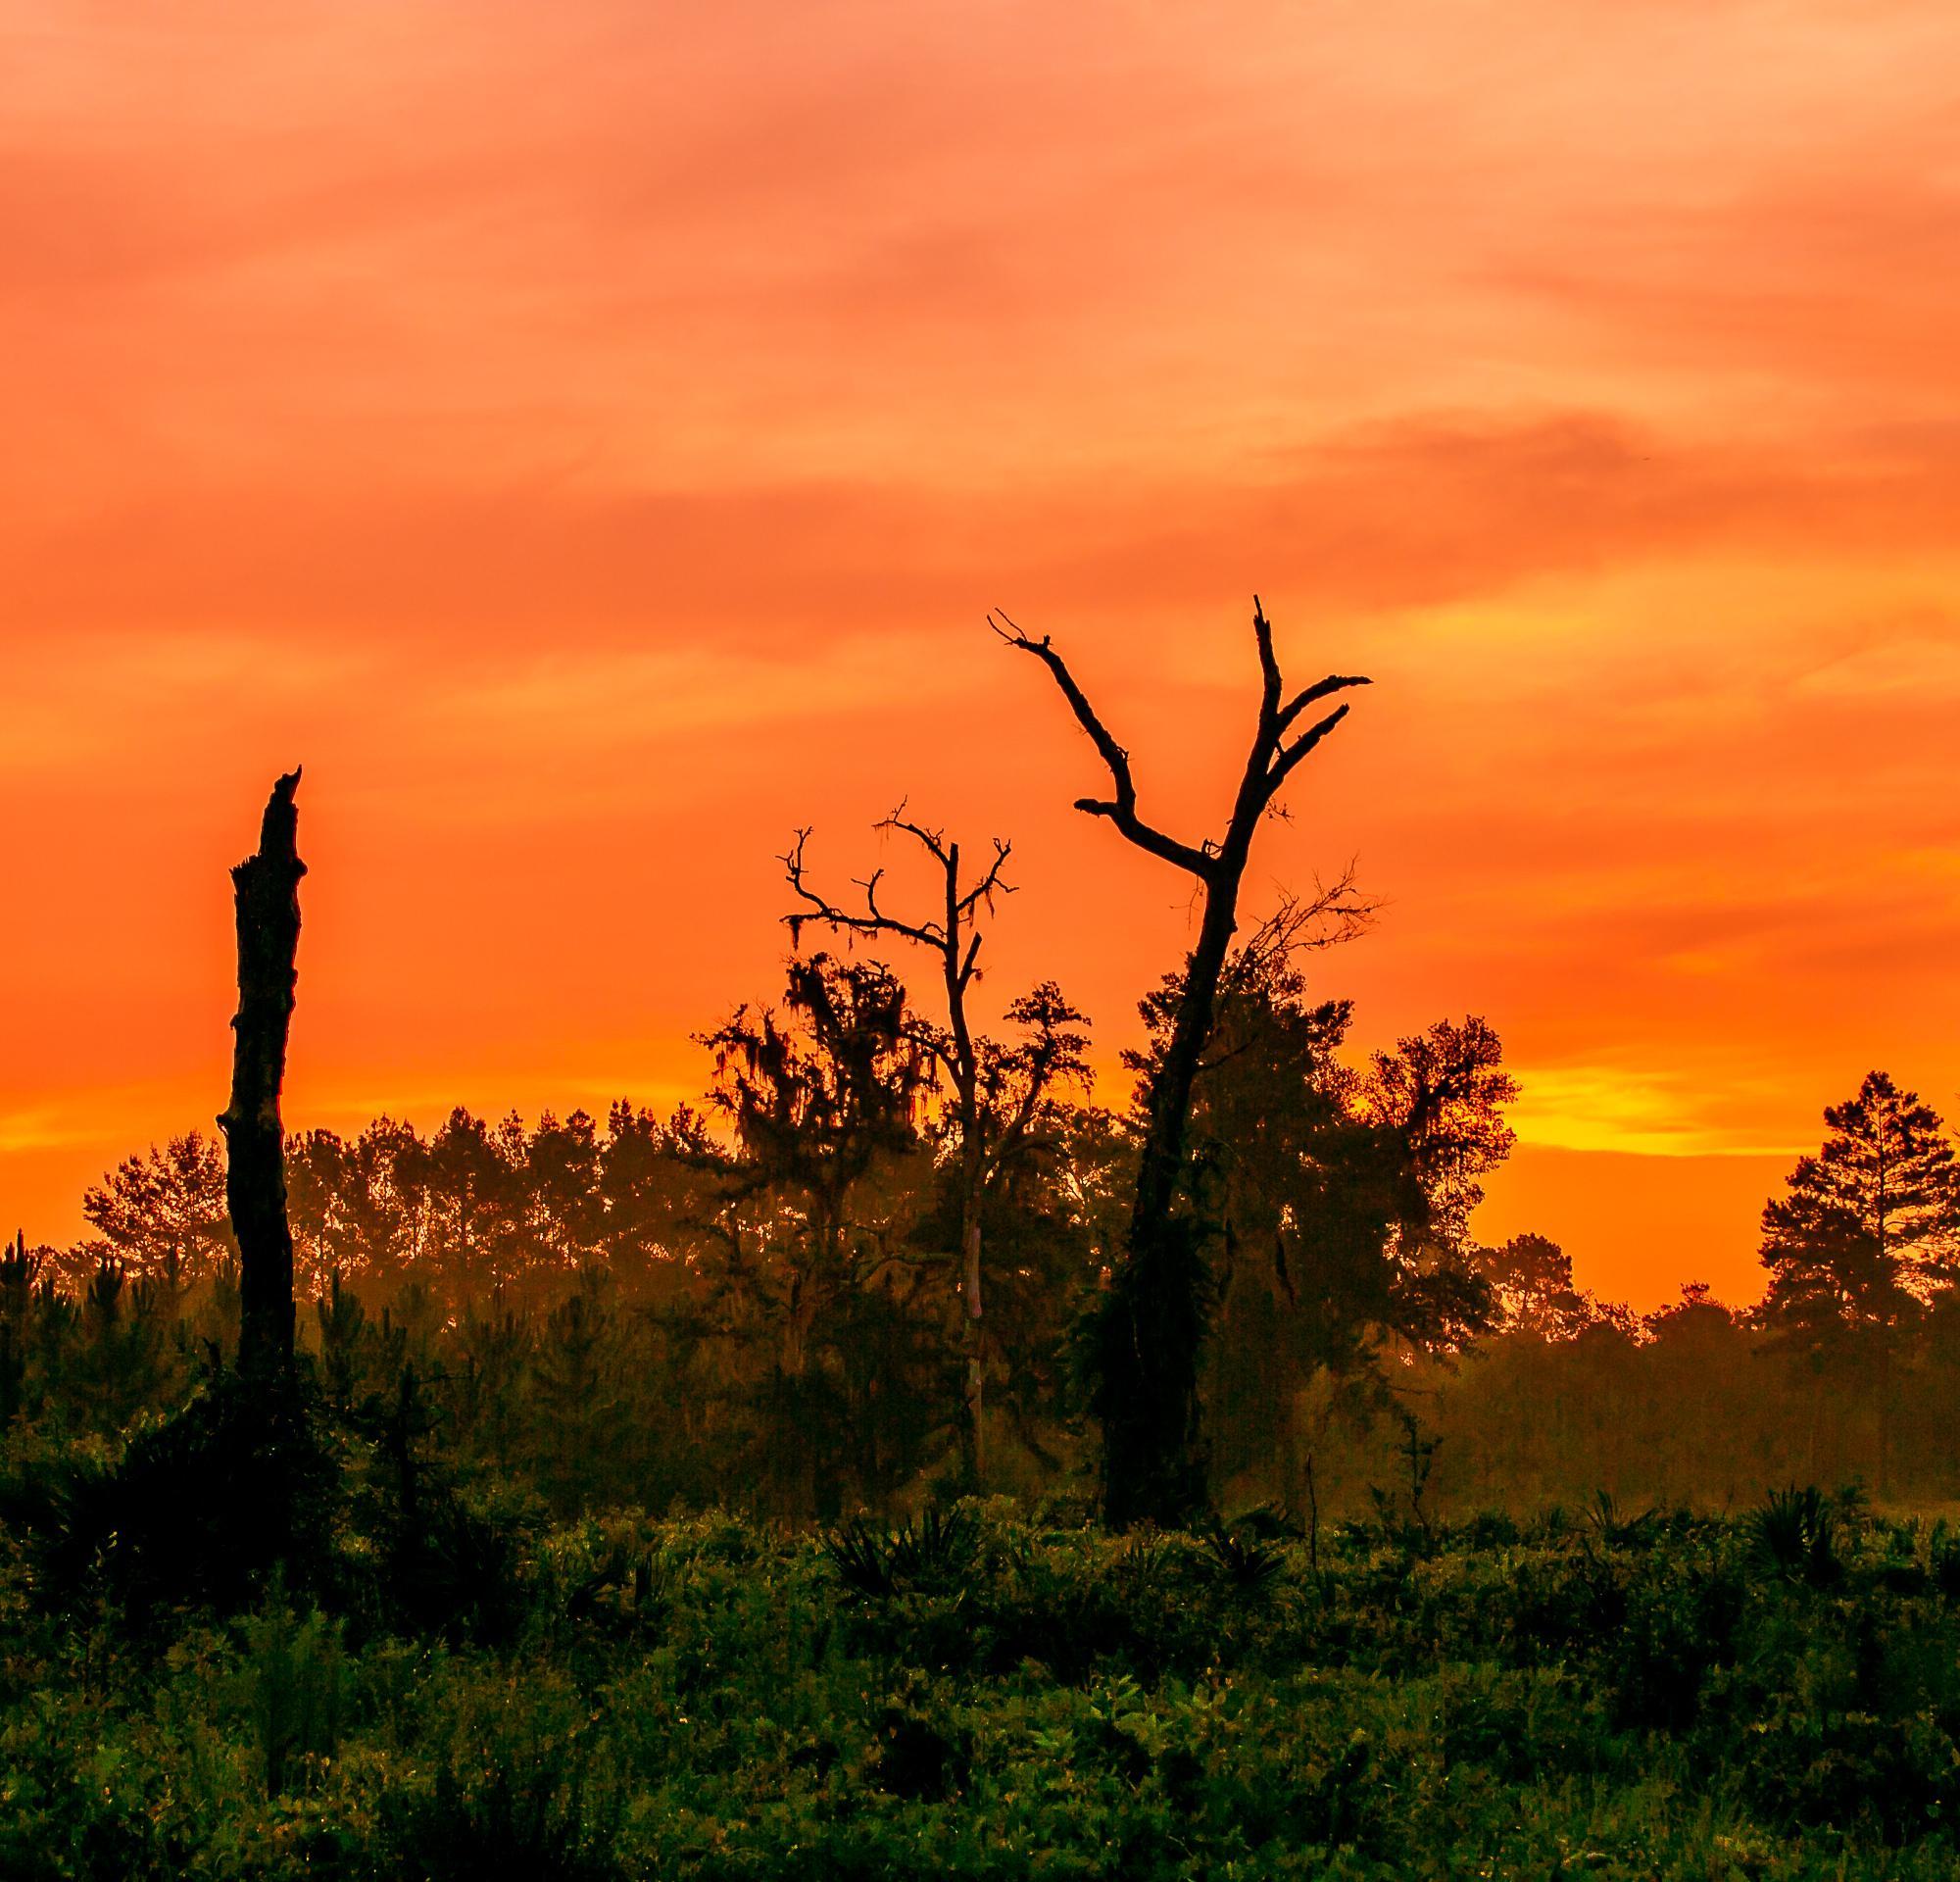 Rural Florida Sunrise #1